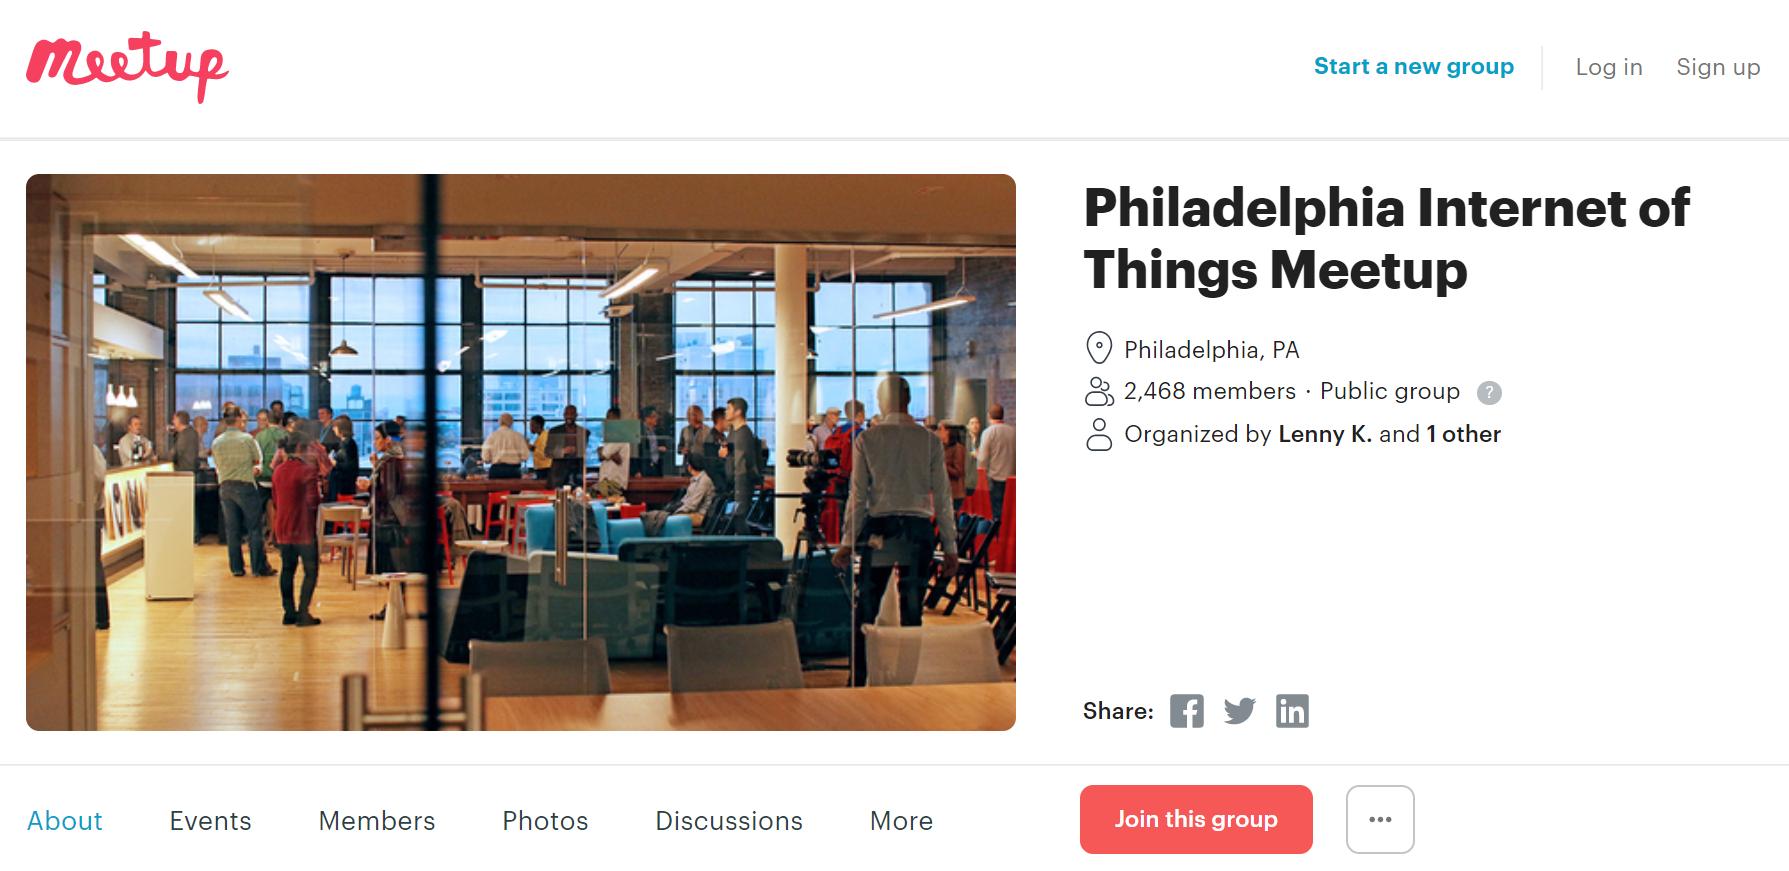 Top 10 Active Meetup Groups In Tech & Entrepreneurial Scene - Fig 5